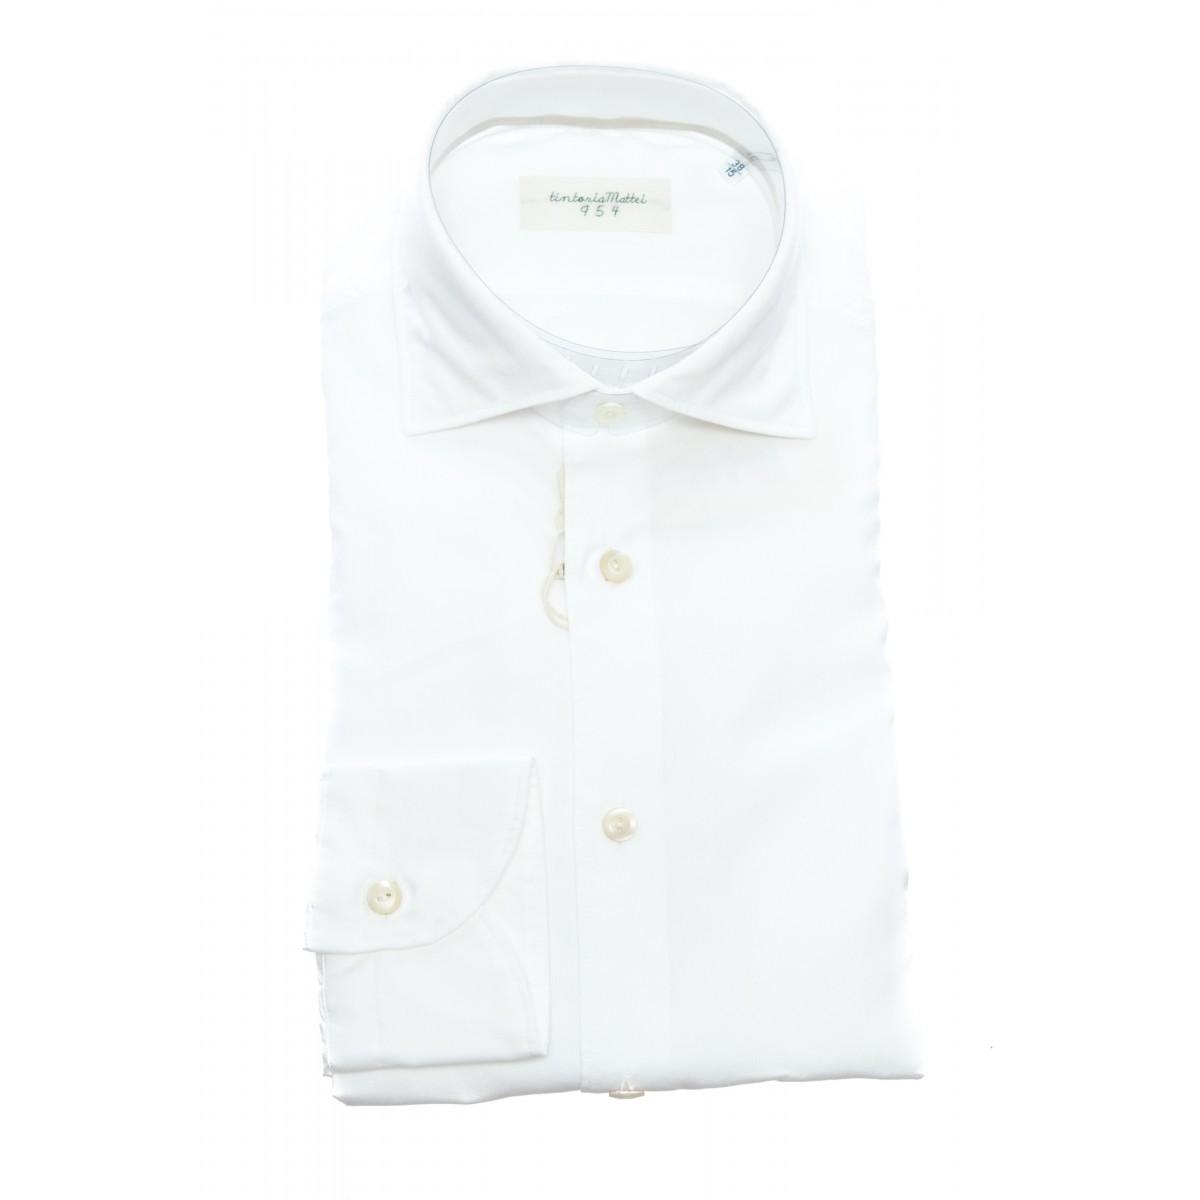 Camicia uomo - Pao njw oxford bianco